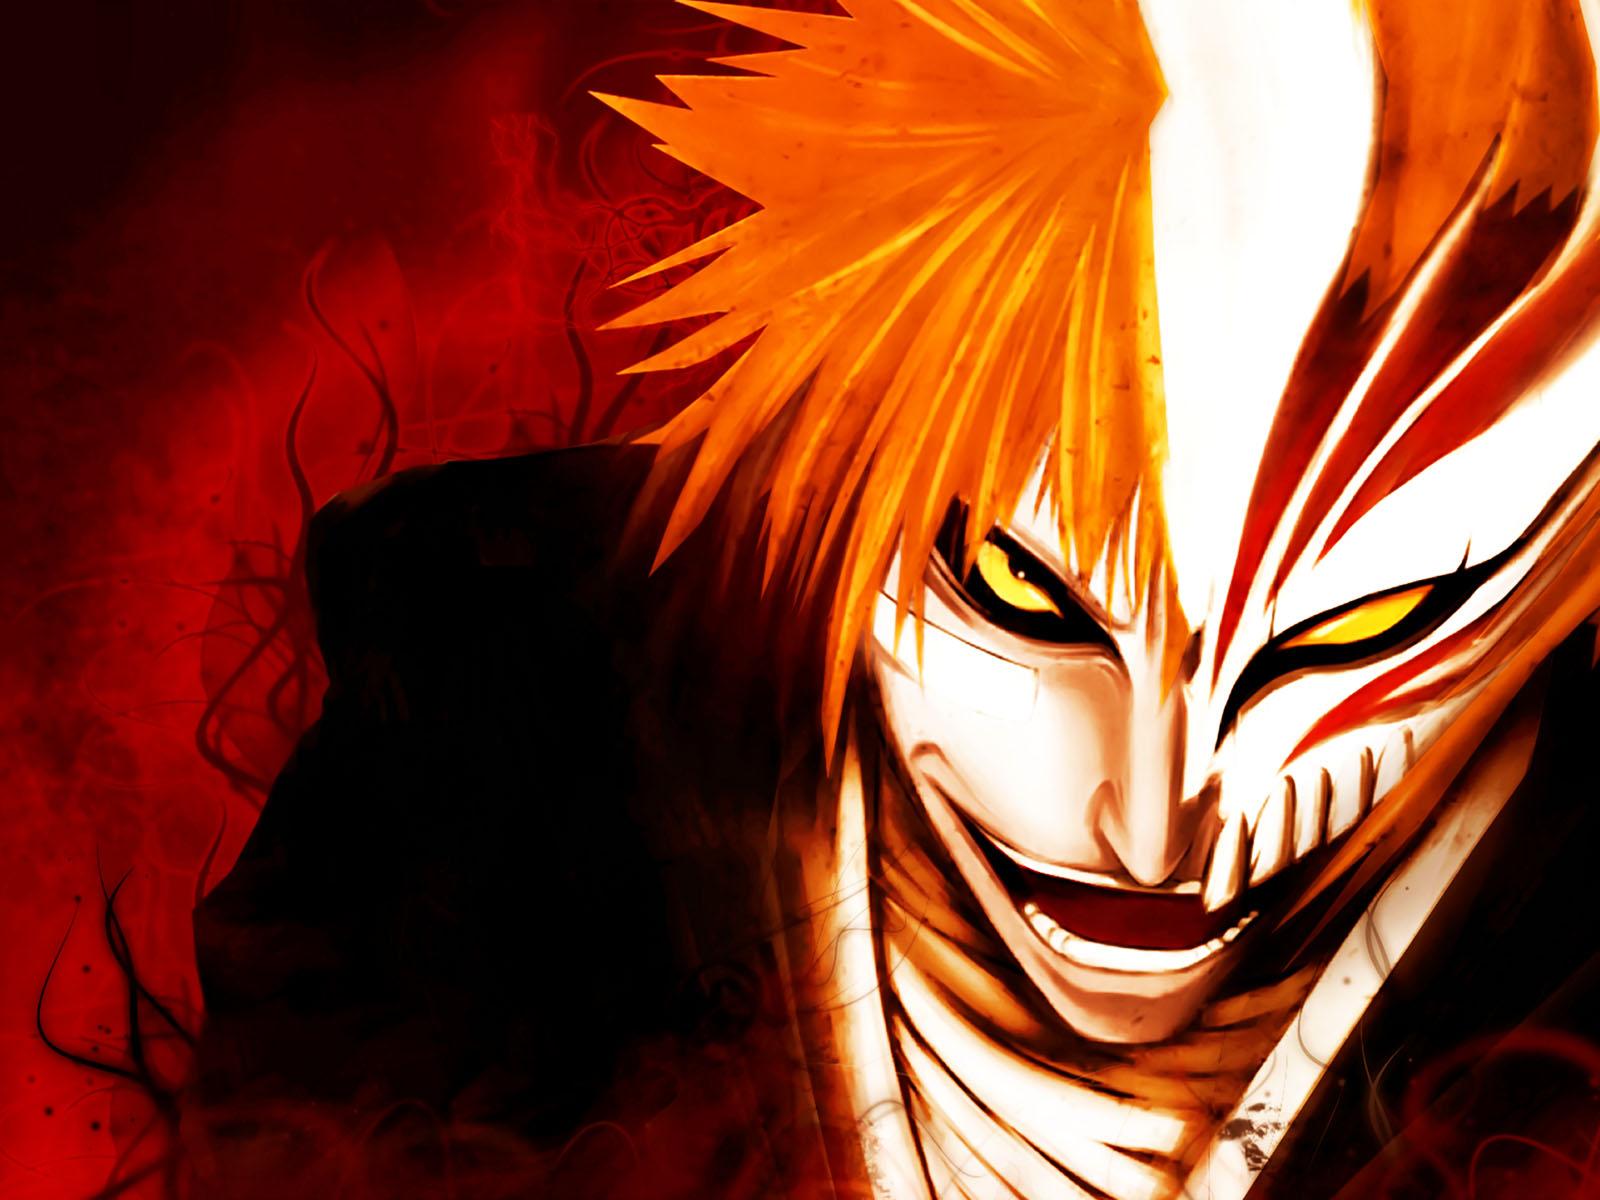 47 cool bleach anime wallpaper on wallpapersafari - Best anime images website ...